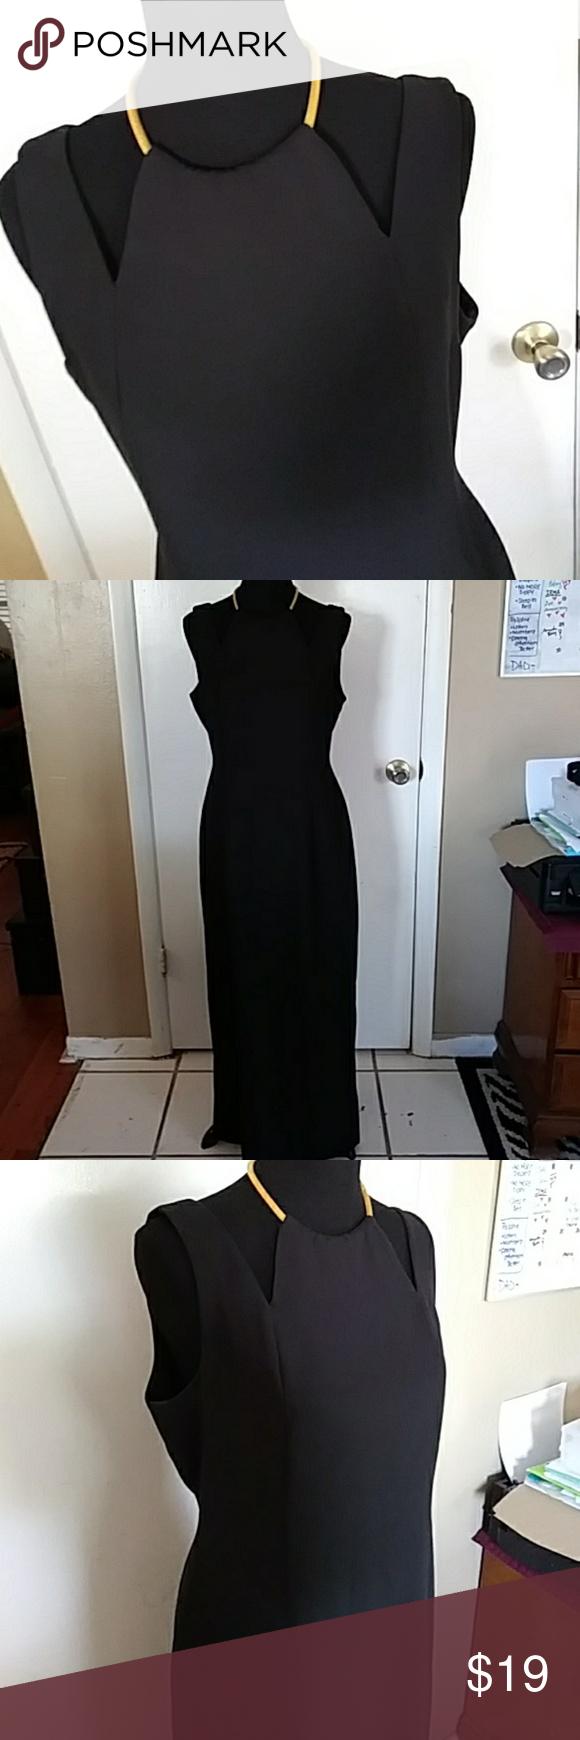 Elegant Black Liz Claiborne Gown Dress Size 12 Liz Claiborne Dresses Gowns Dresses Clothes Design [ 1740 x 580 Pixel ]